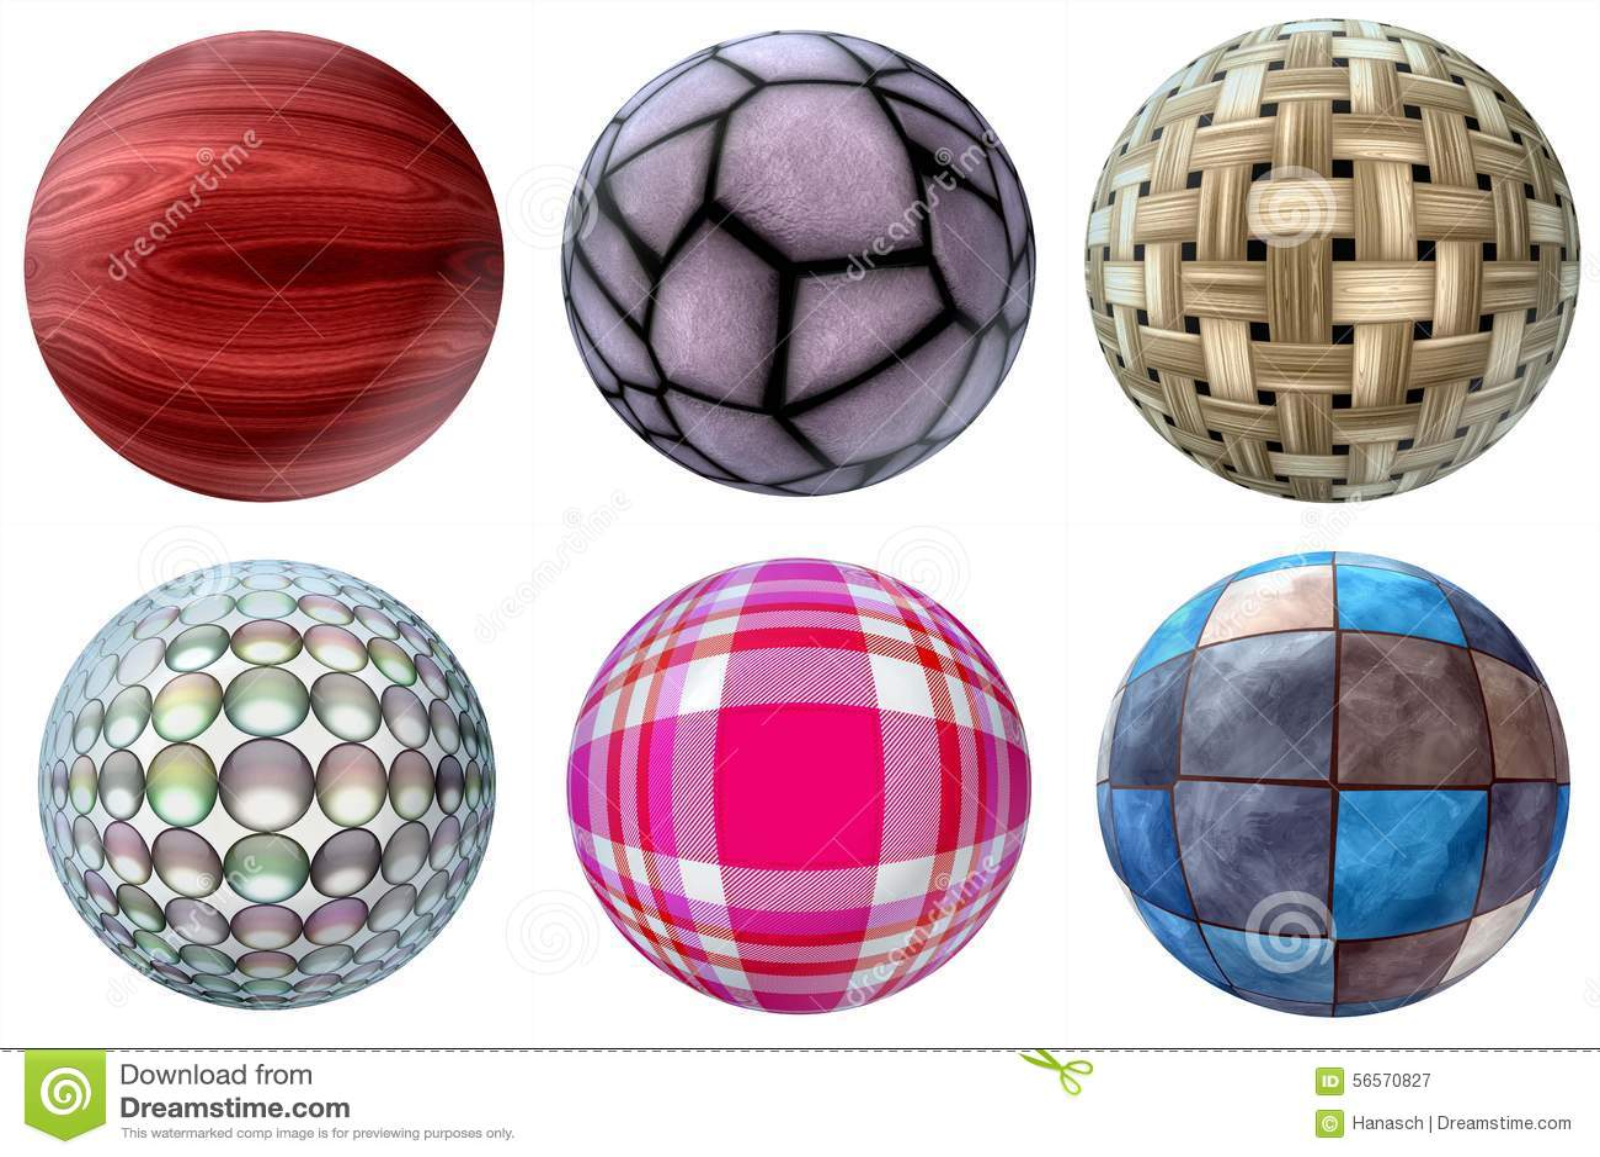 boules de diff rents mat riaux illustration stock image 56570827. Black Bedroom Furniture Sets. Home Design Ideas